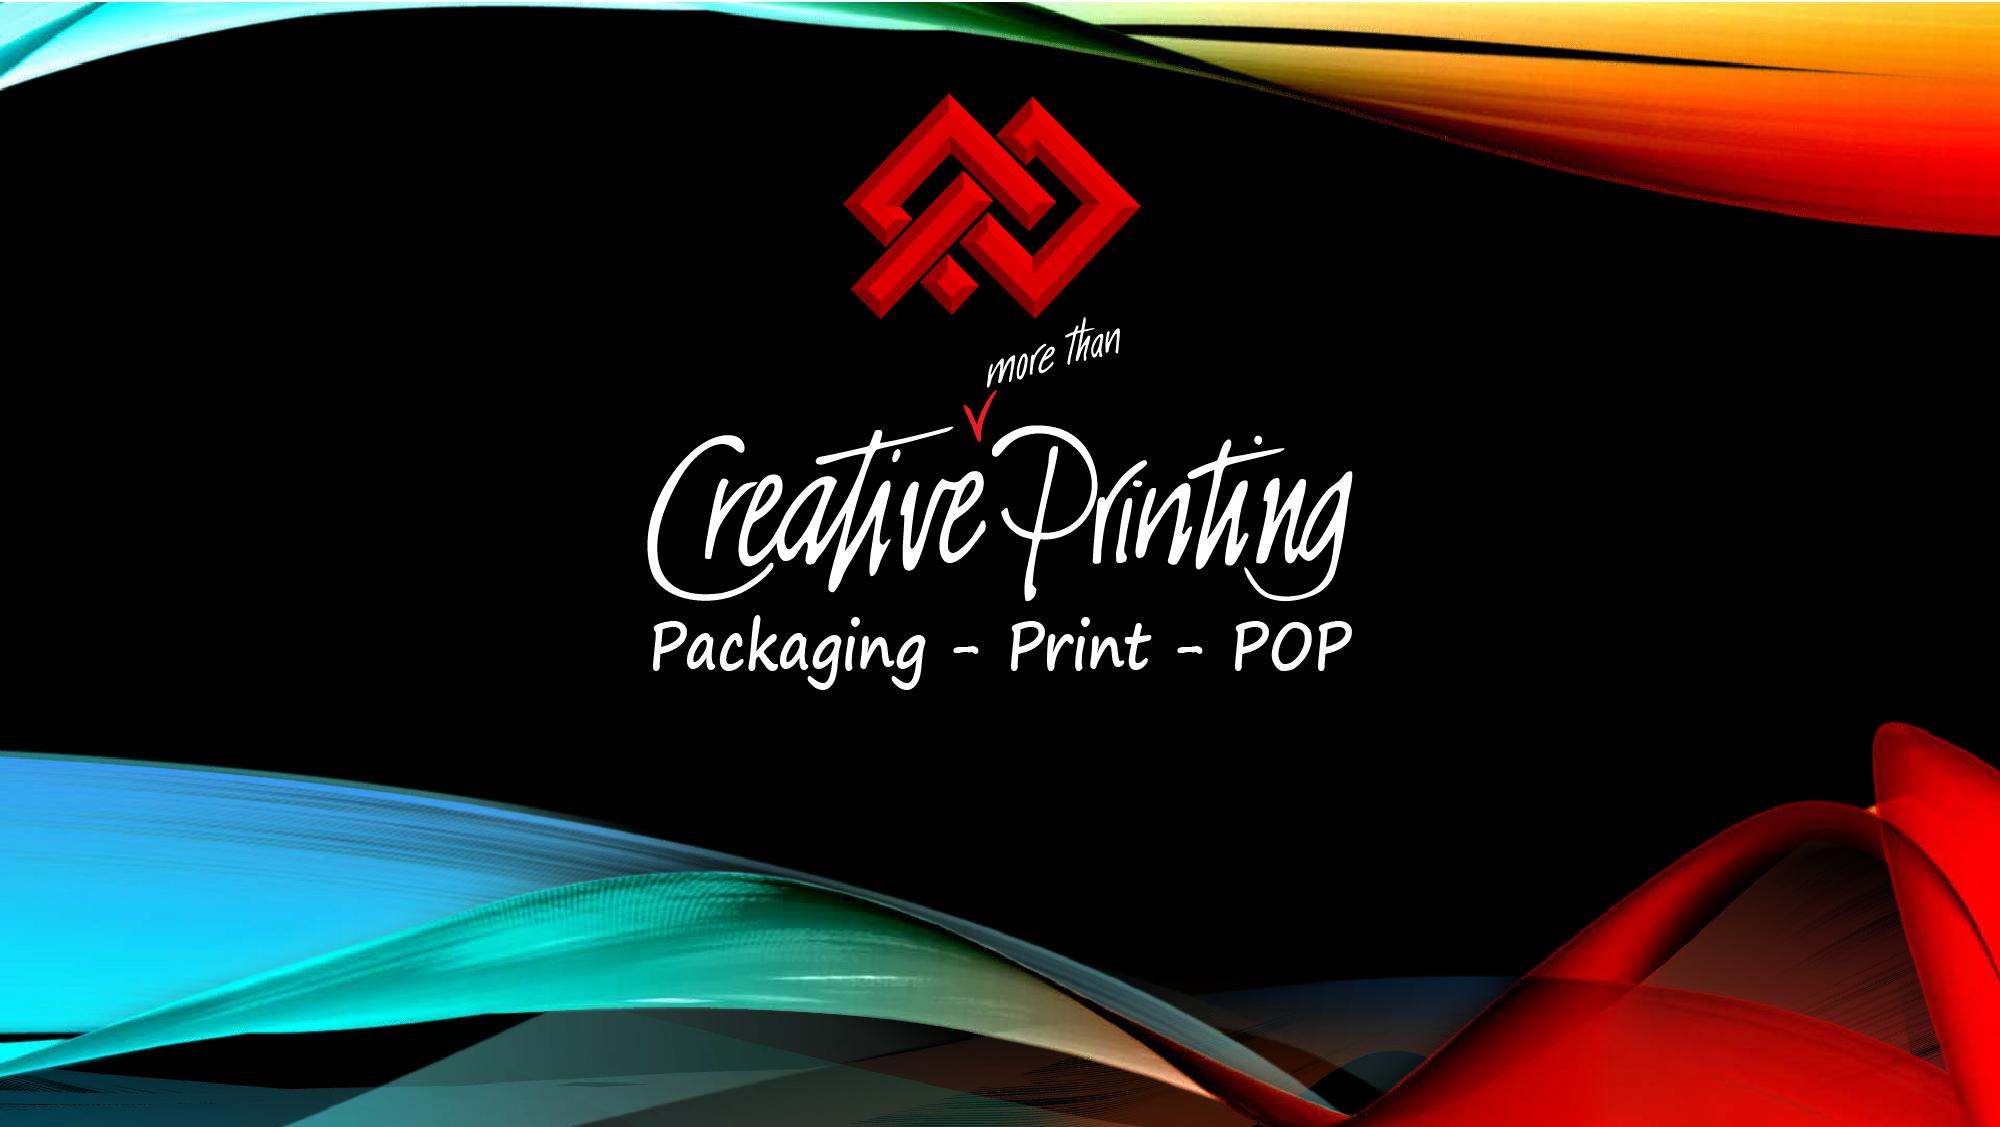 CPCwebsite_HomePage_Gallery-Main.png